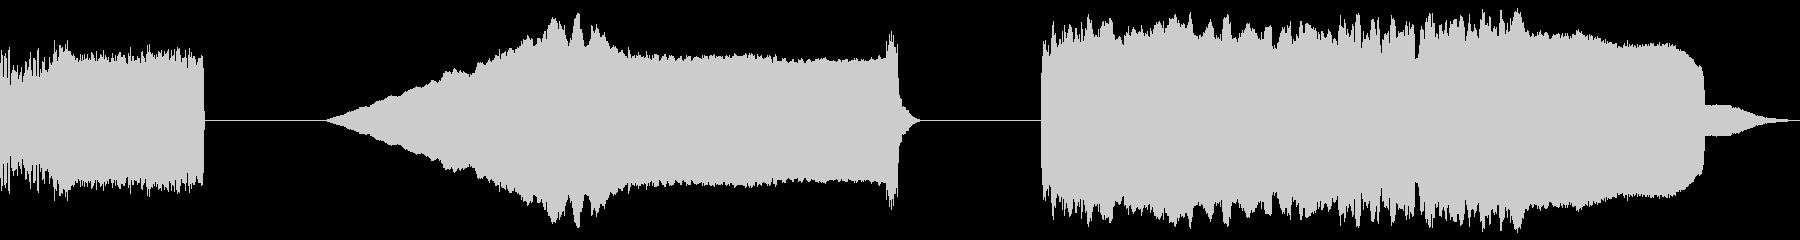 GUITAR FX、3バージョン、...の未再生の波形